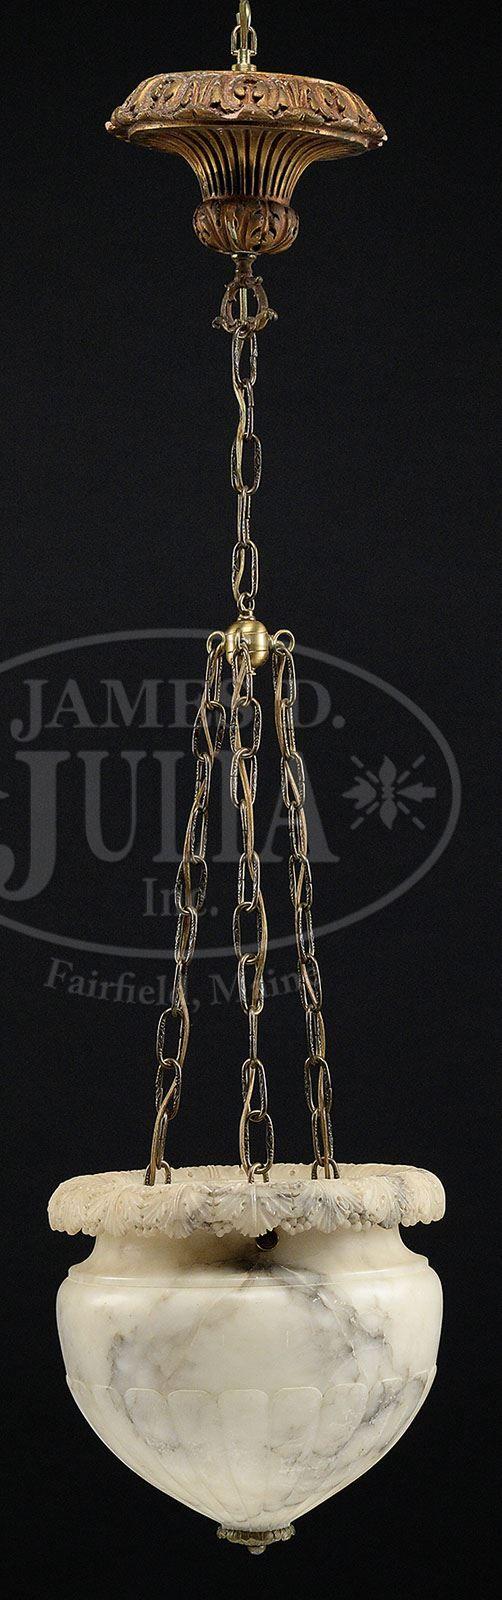 37 best alabaster lighting images on pinterest chandeliers carved alabaster hanging light 19th century arubaitofo Choice Image